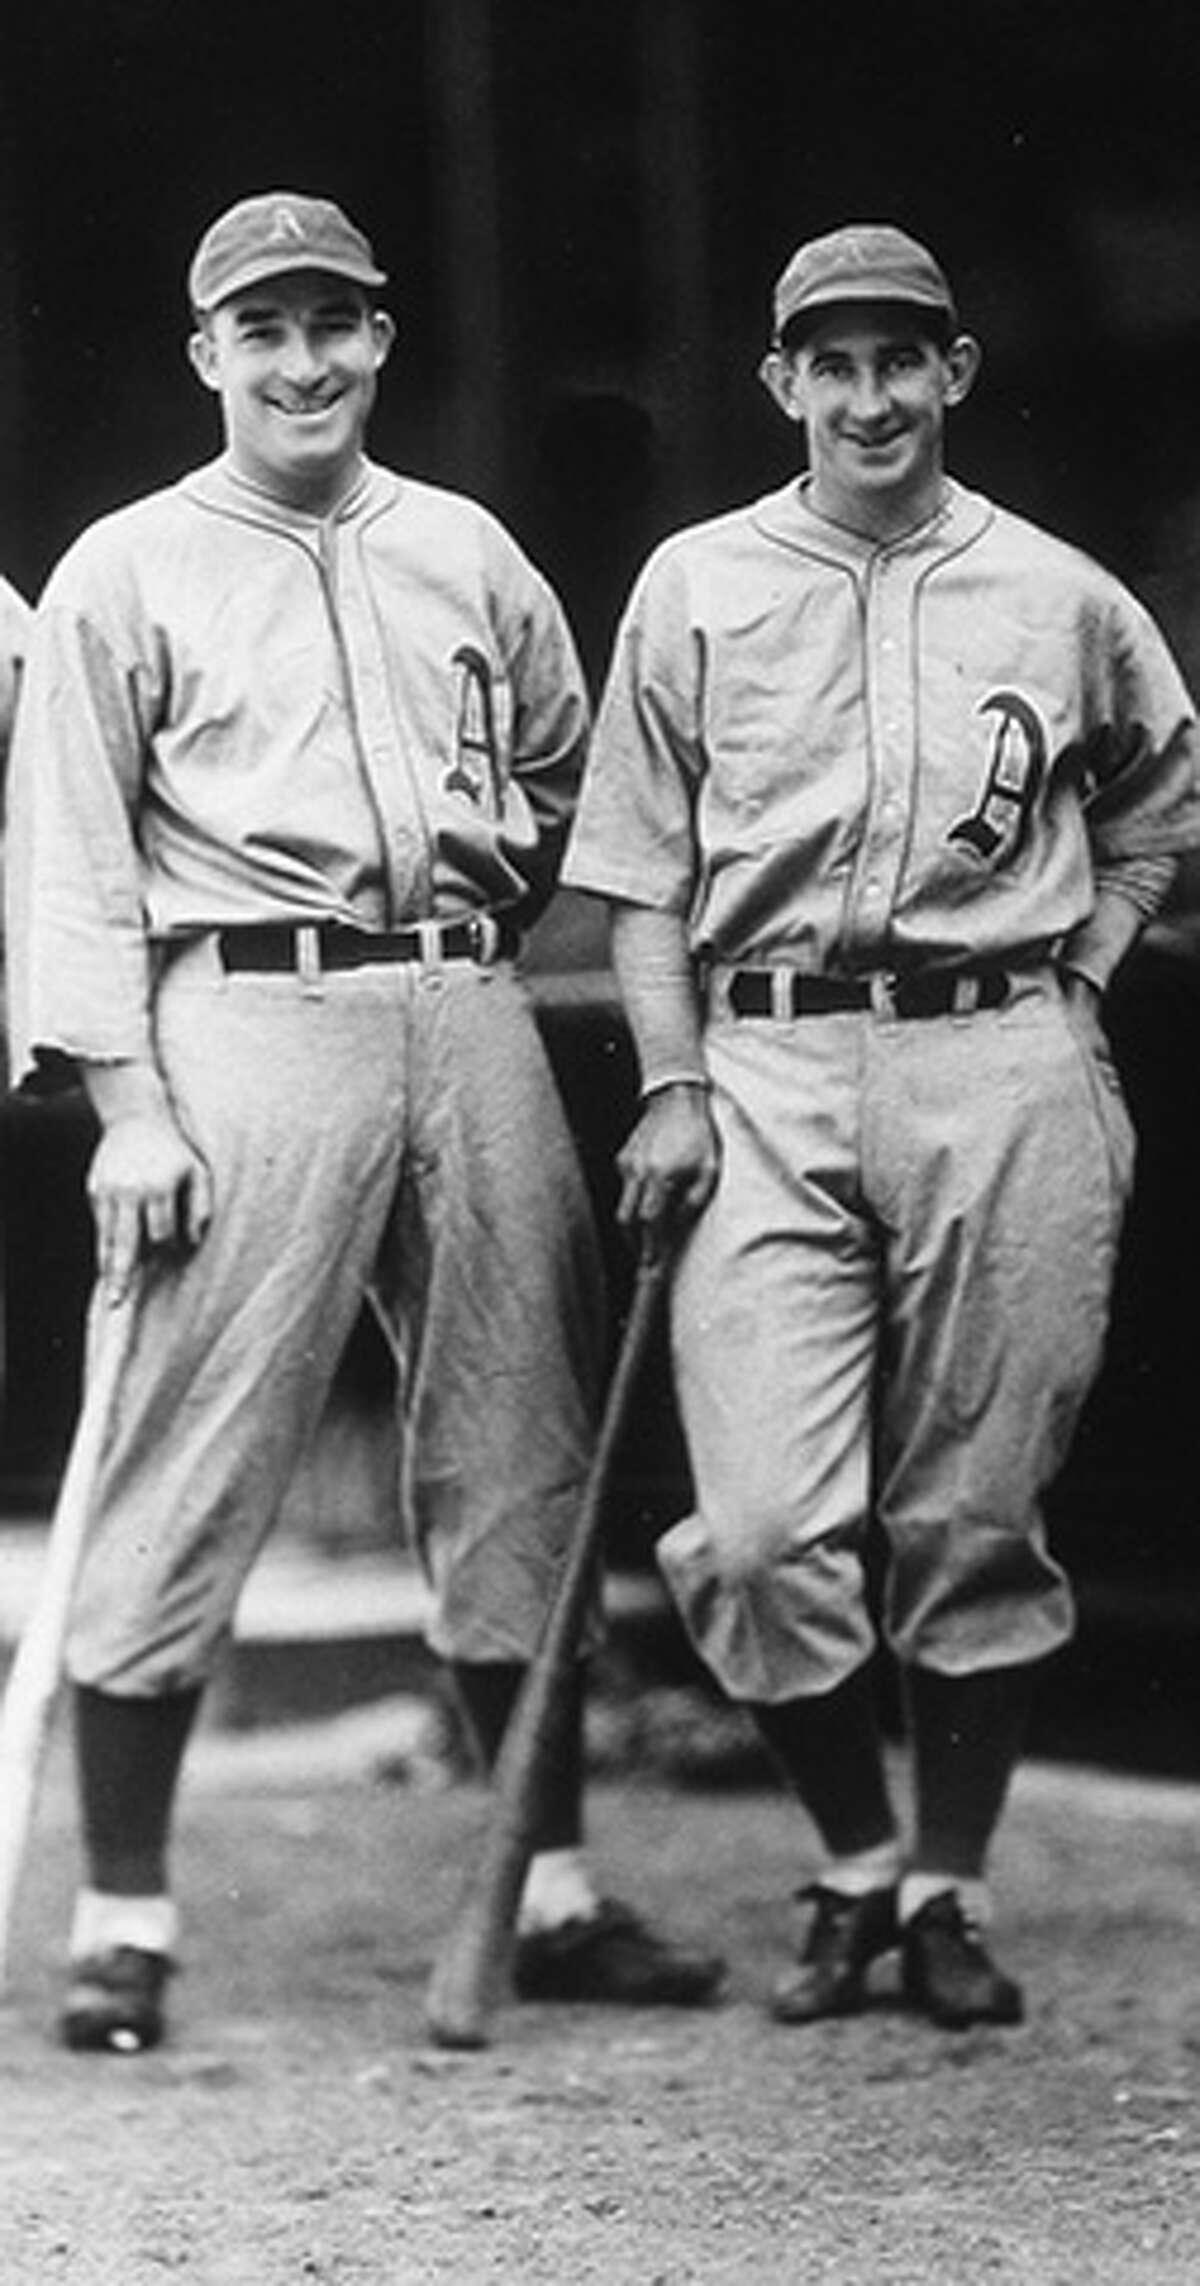 ALL-TIME BEST DUOS IN BASEBALL 28. Al Simmons (left)/Mickey Cochrane (right), 1925-32 Philadelphia Athletics Cumulative WAR:83.7 (27th) Average annual WAR:10.46 (20th)